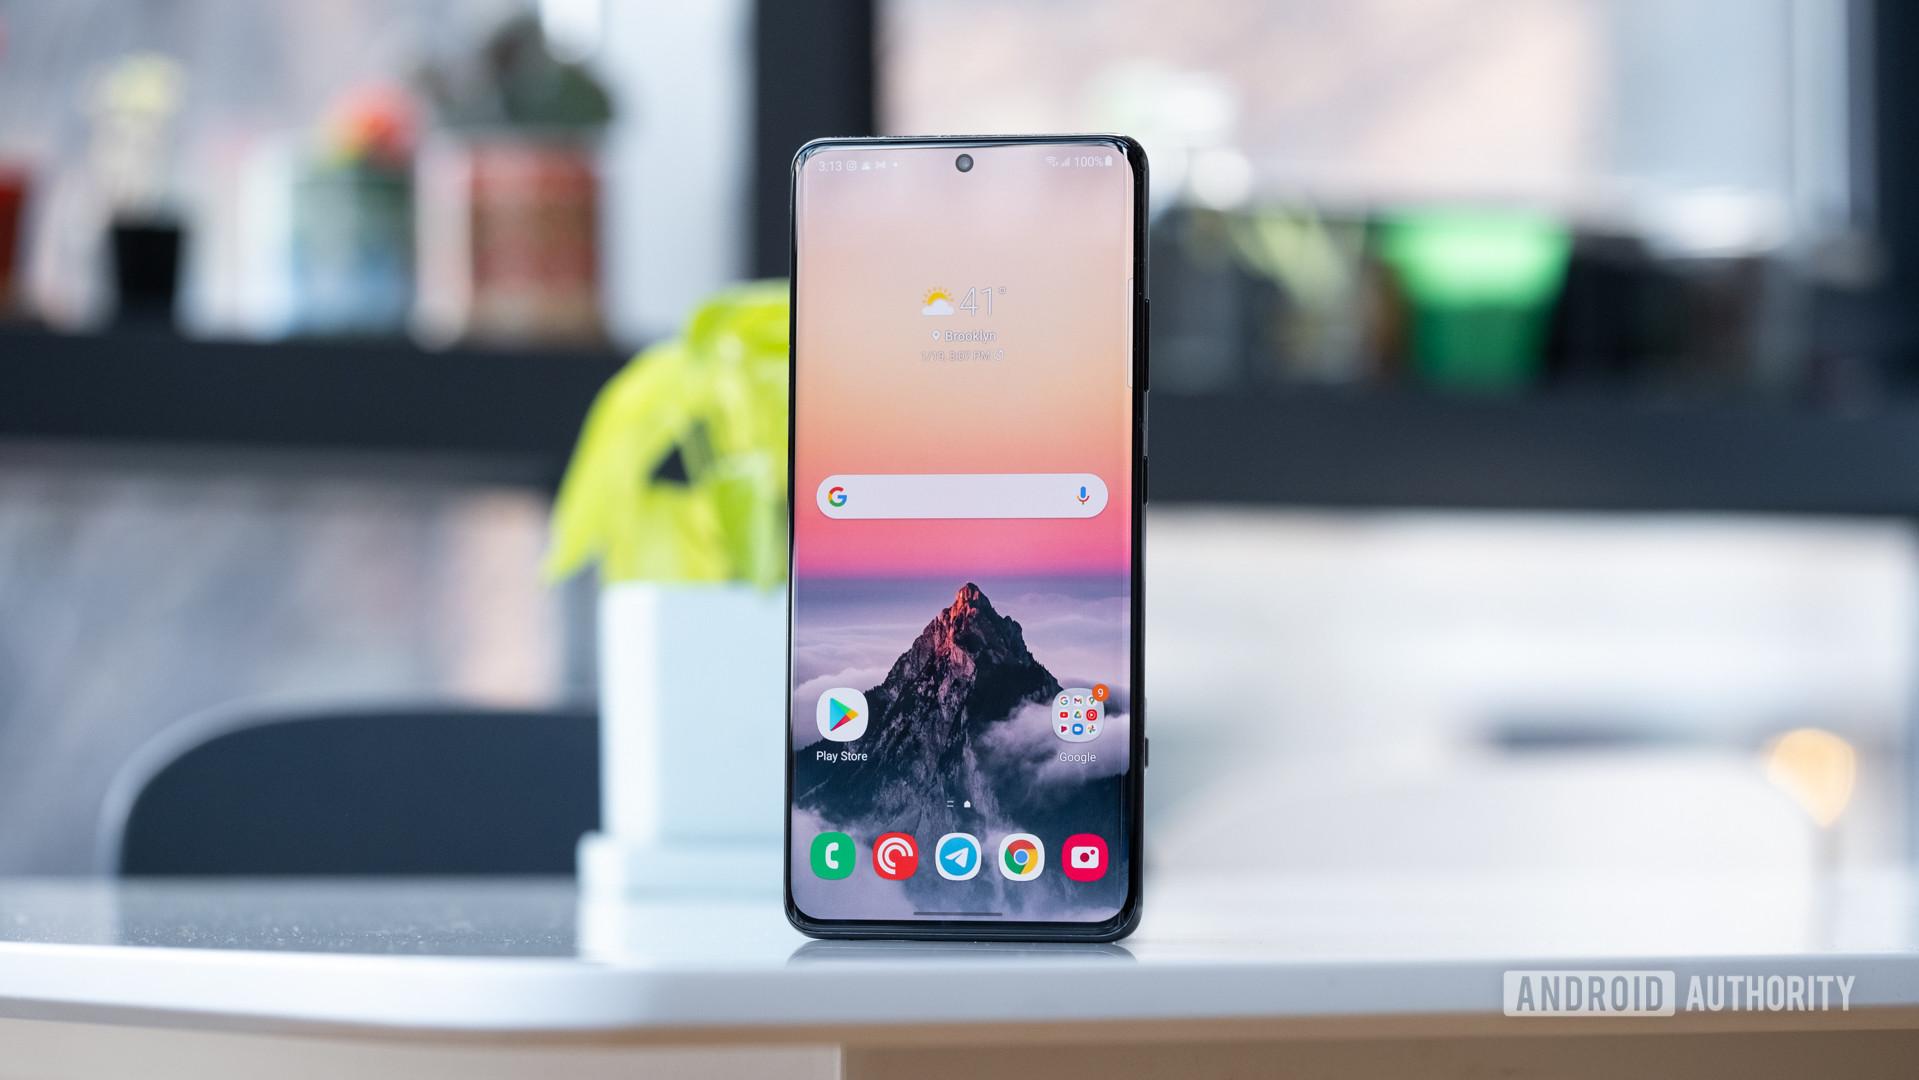 Samsung Galaxy S21 Ultra display on table straight on